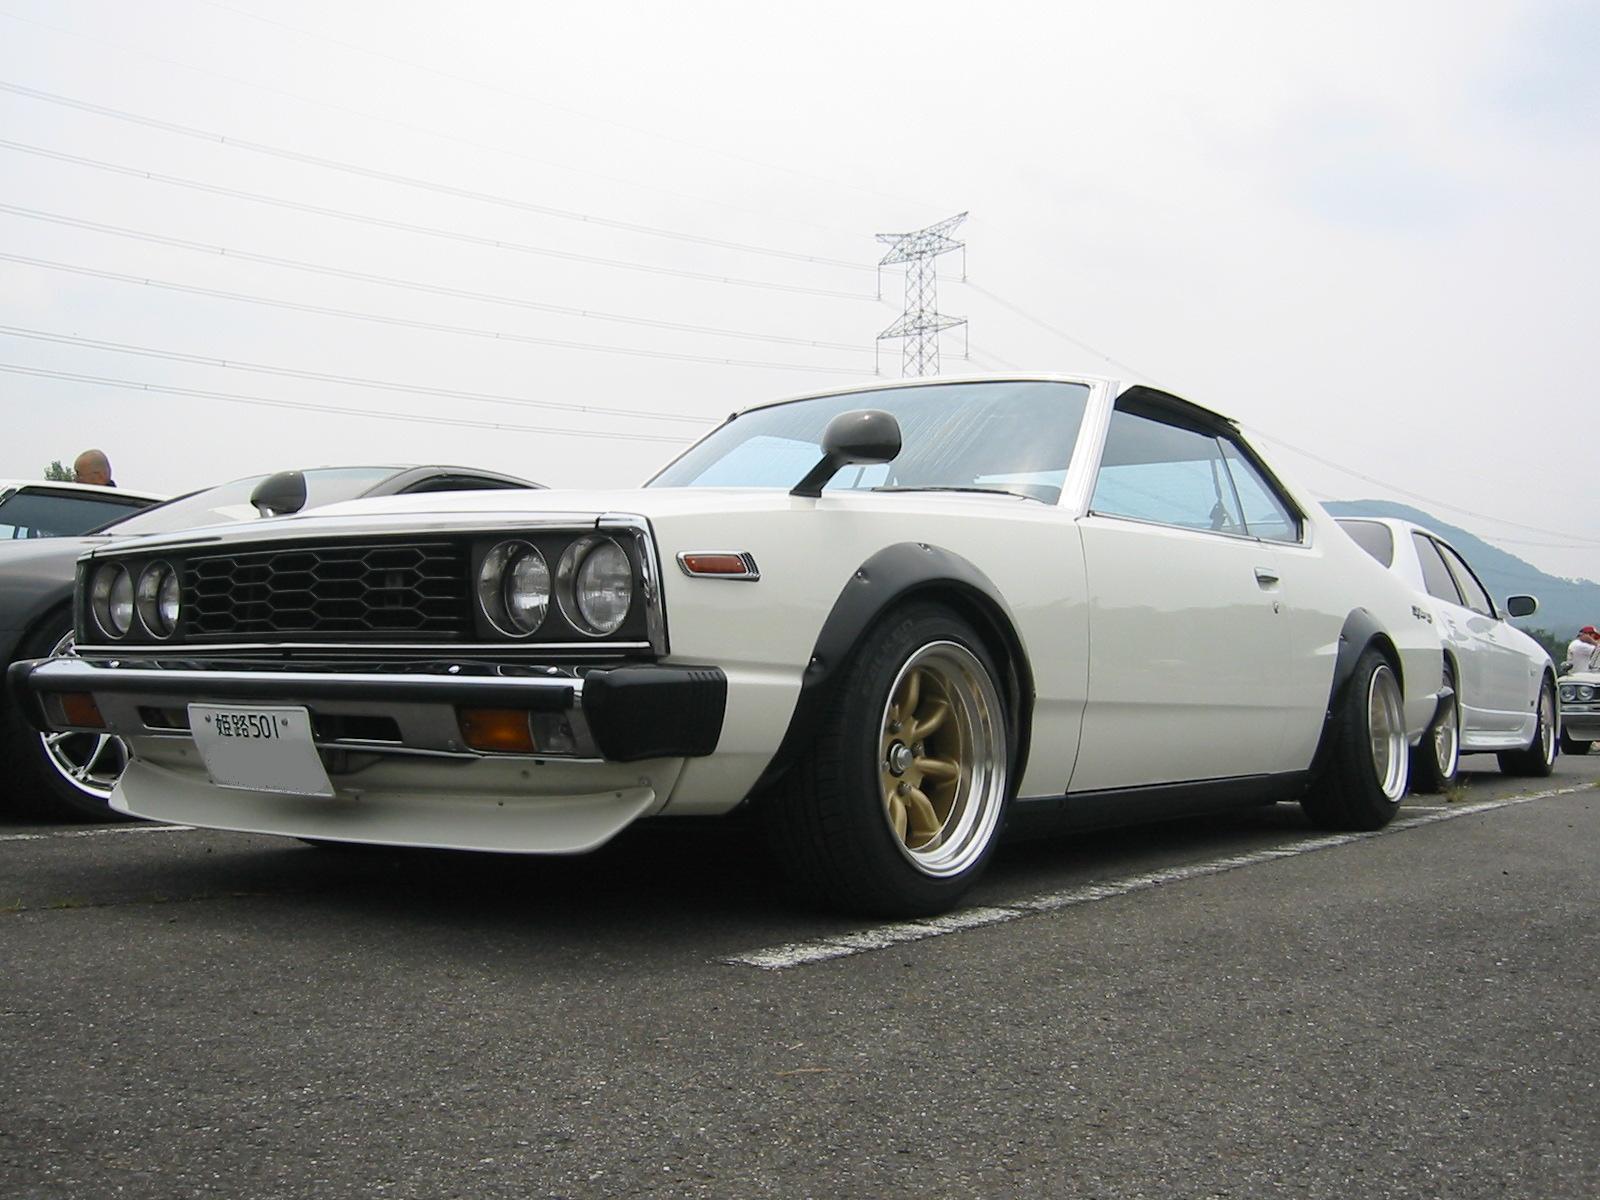 Kyusha style Nissan Skyline C210